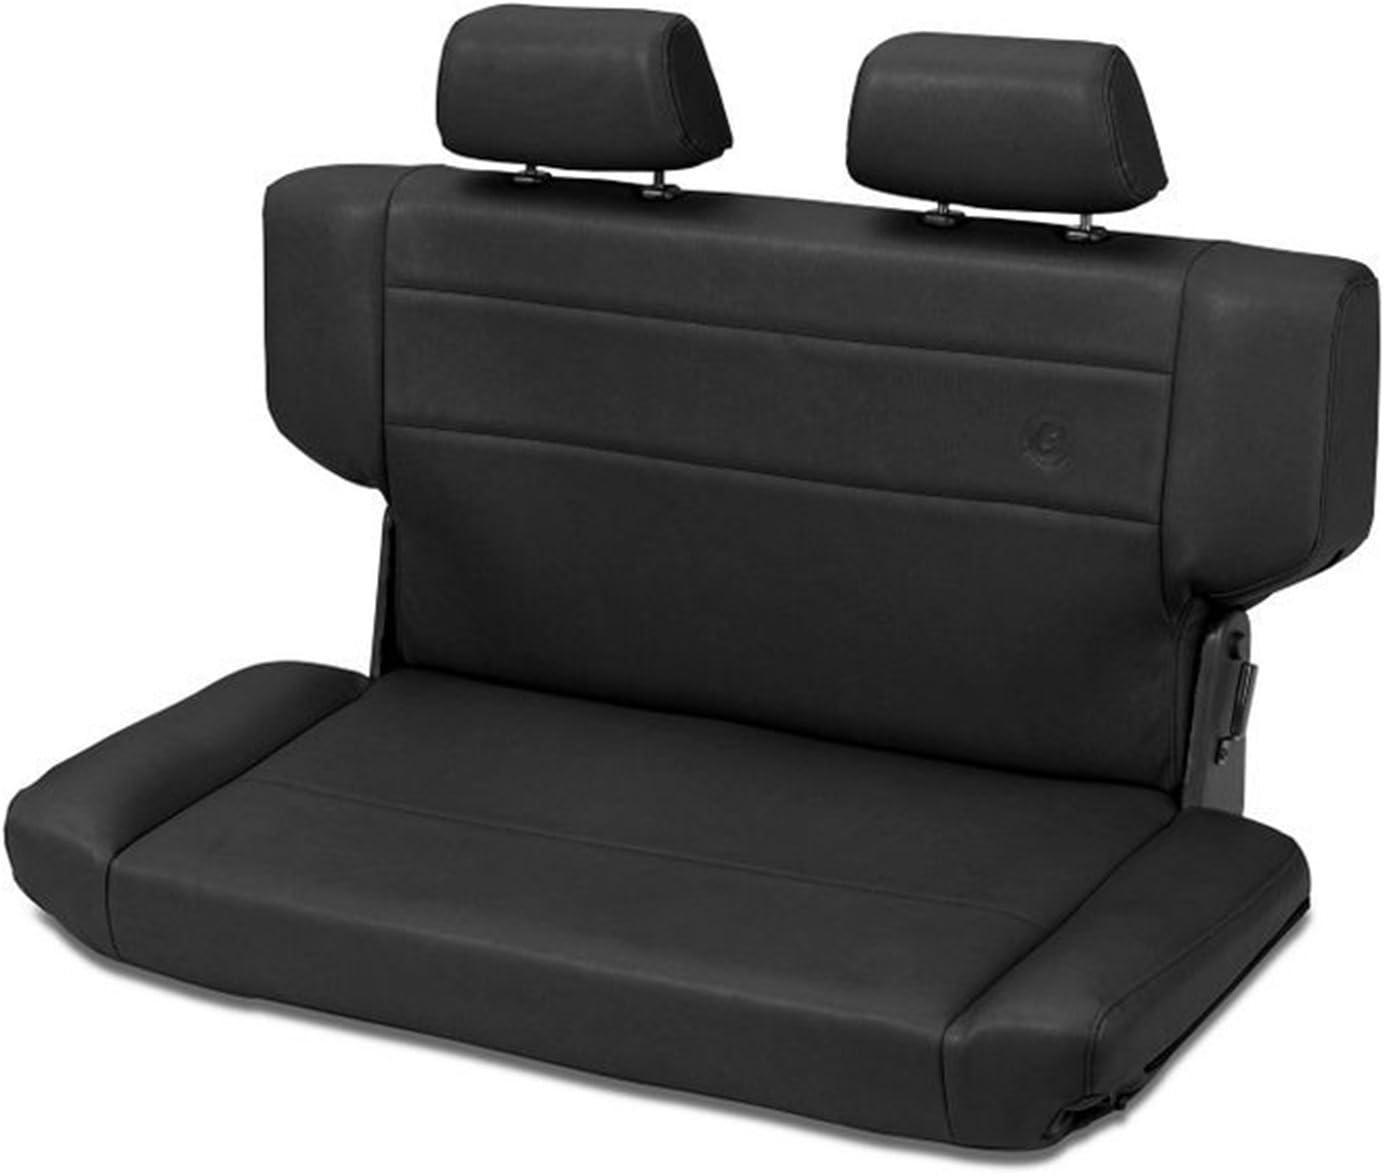 Bestop 3943501 Trailmax II Rear Fold-N-Tumble Black Crush Rear Seat - Jeep 1997-2006 Wrangler